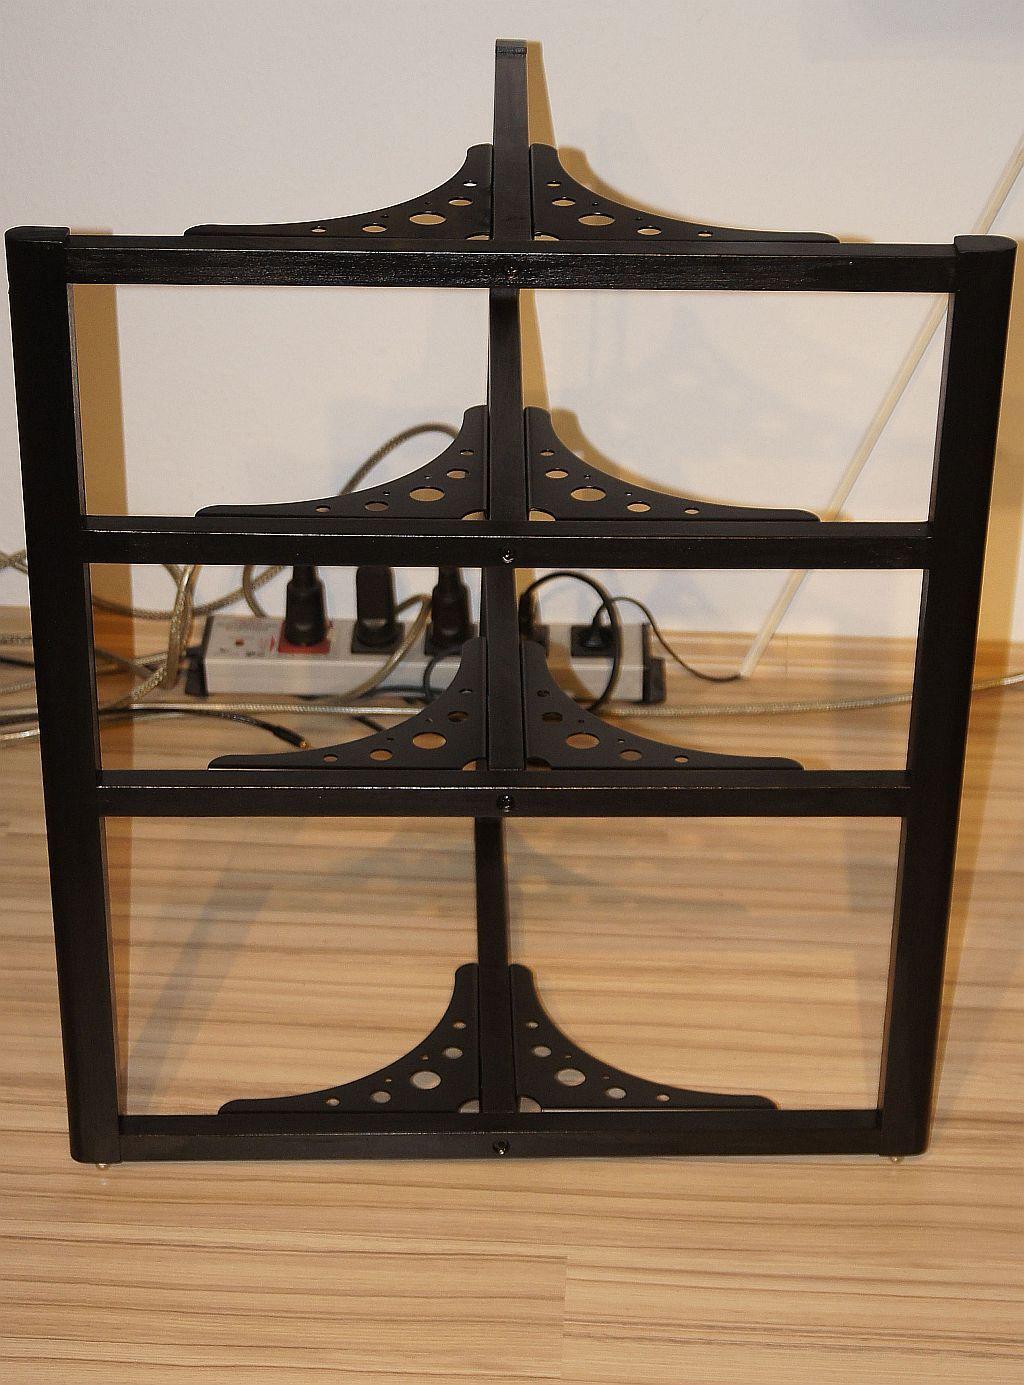 der ikea hack thread seite 3 diy hifi forum. Black Bedroom Furniture Sets. Home Design Ideas